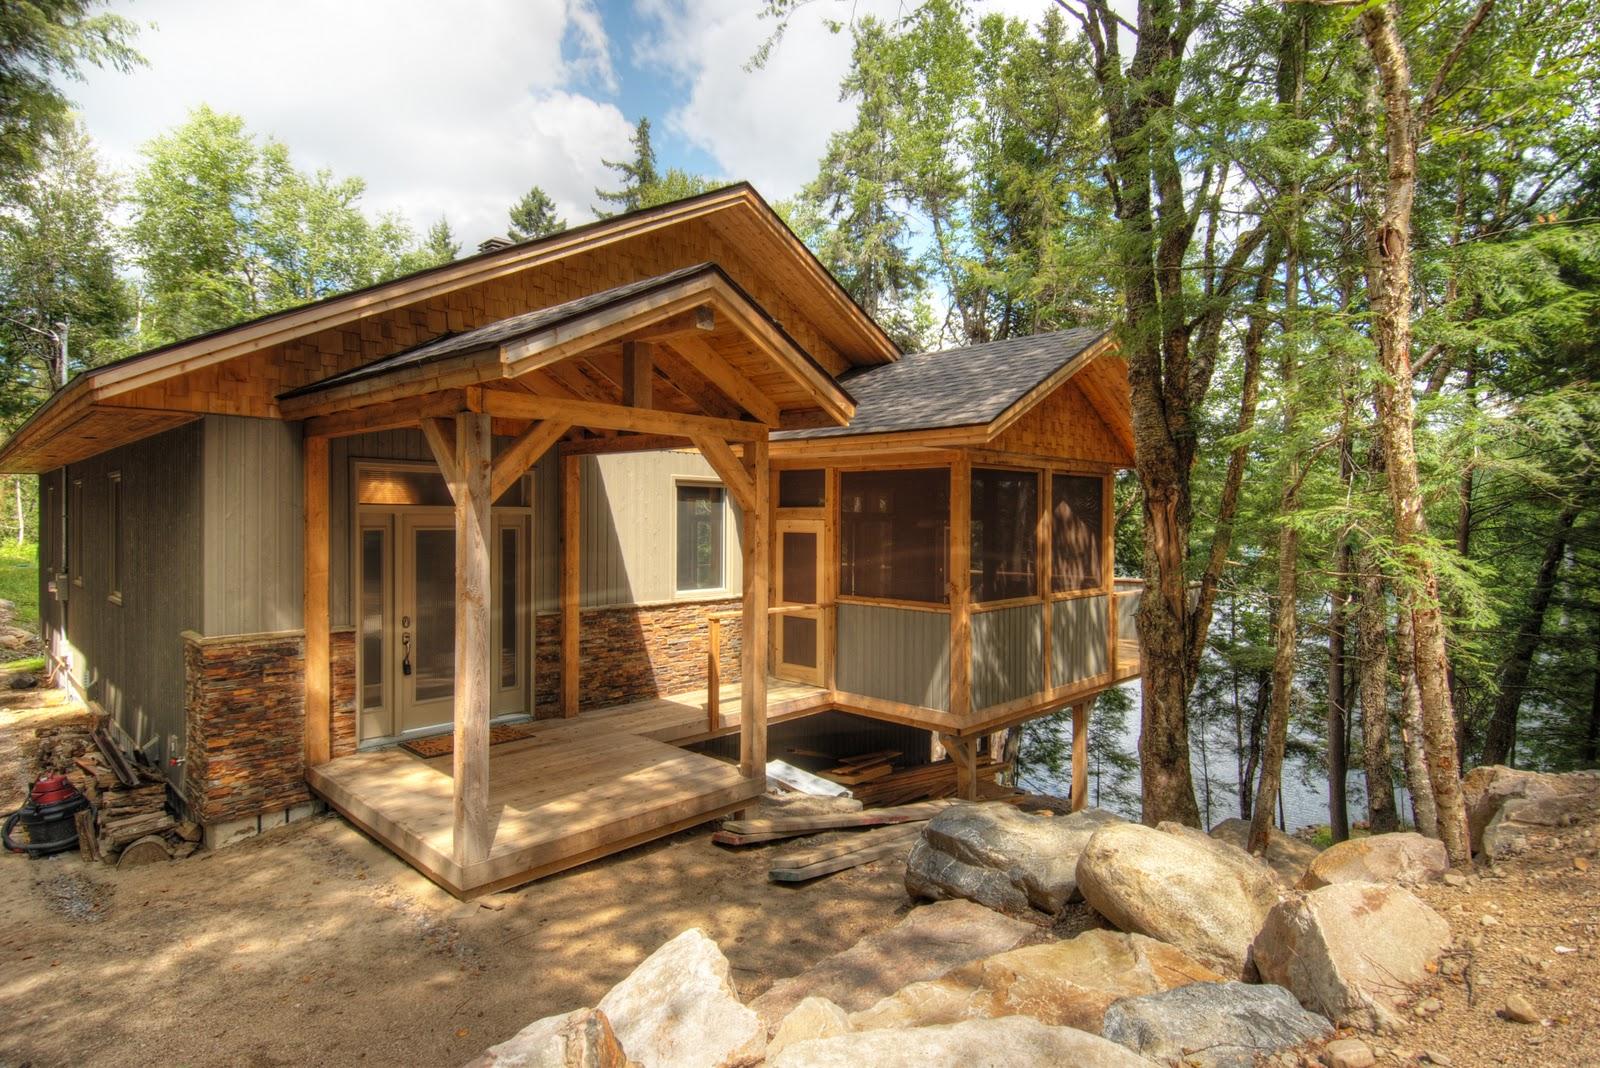 Small Rustic Cabin Plans | HomesFeed